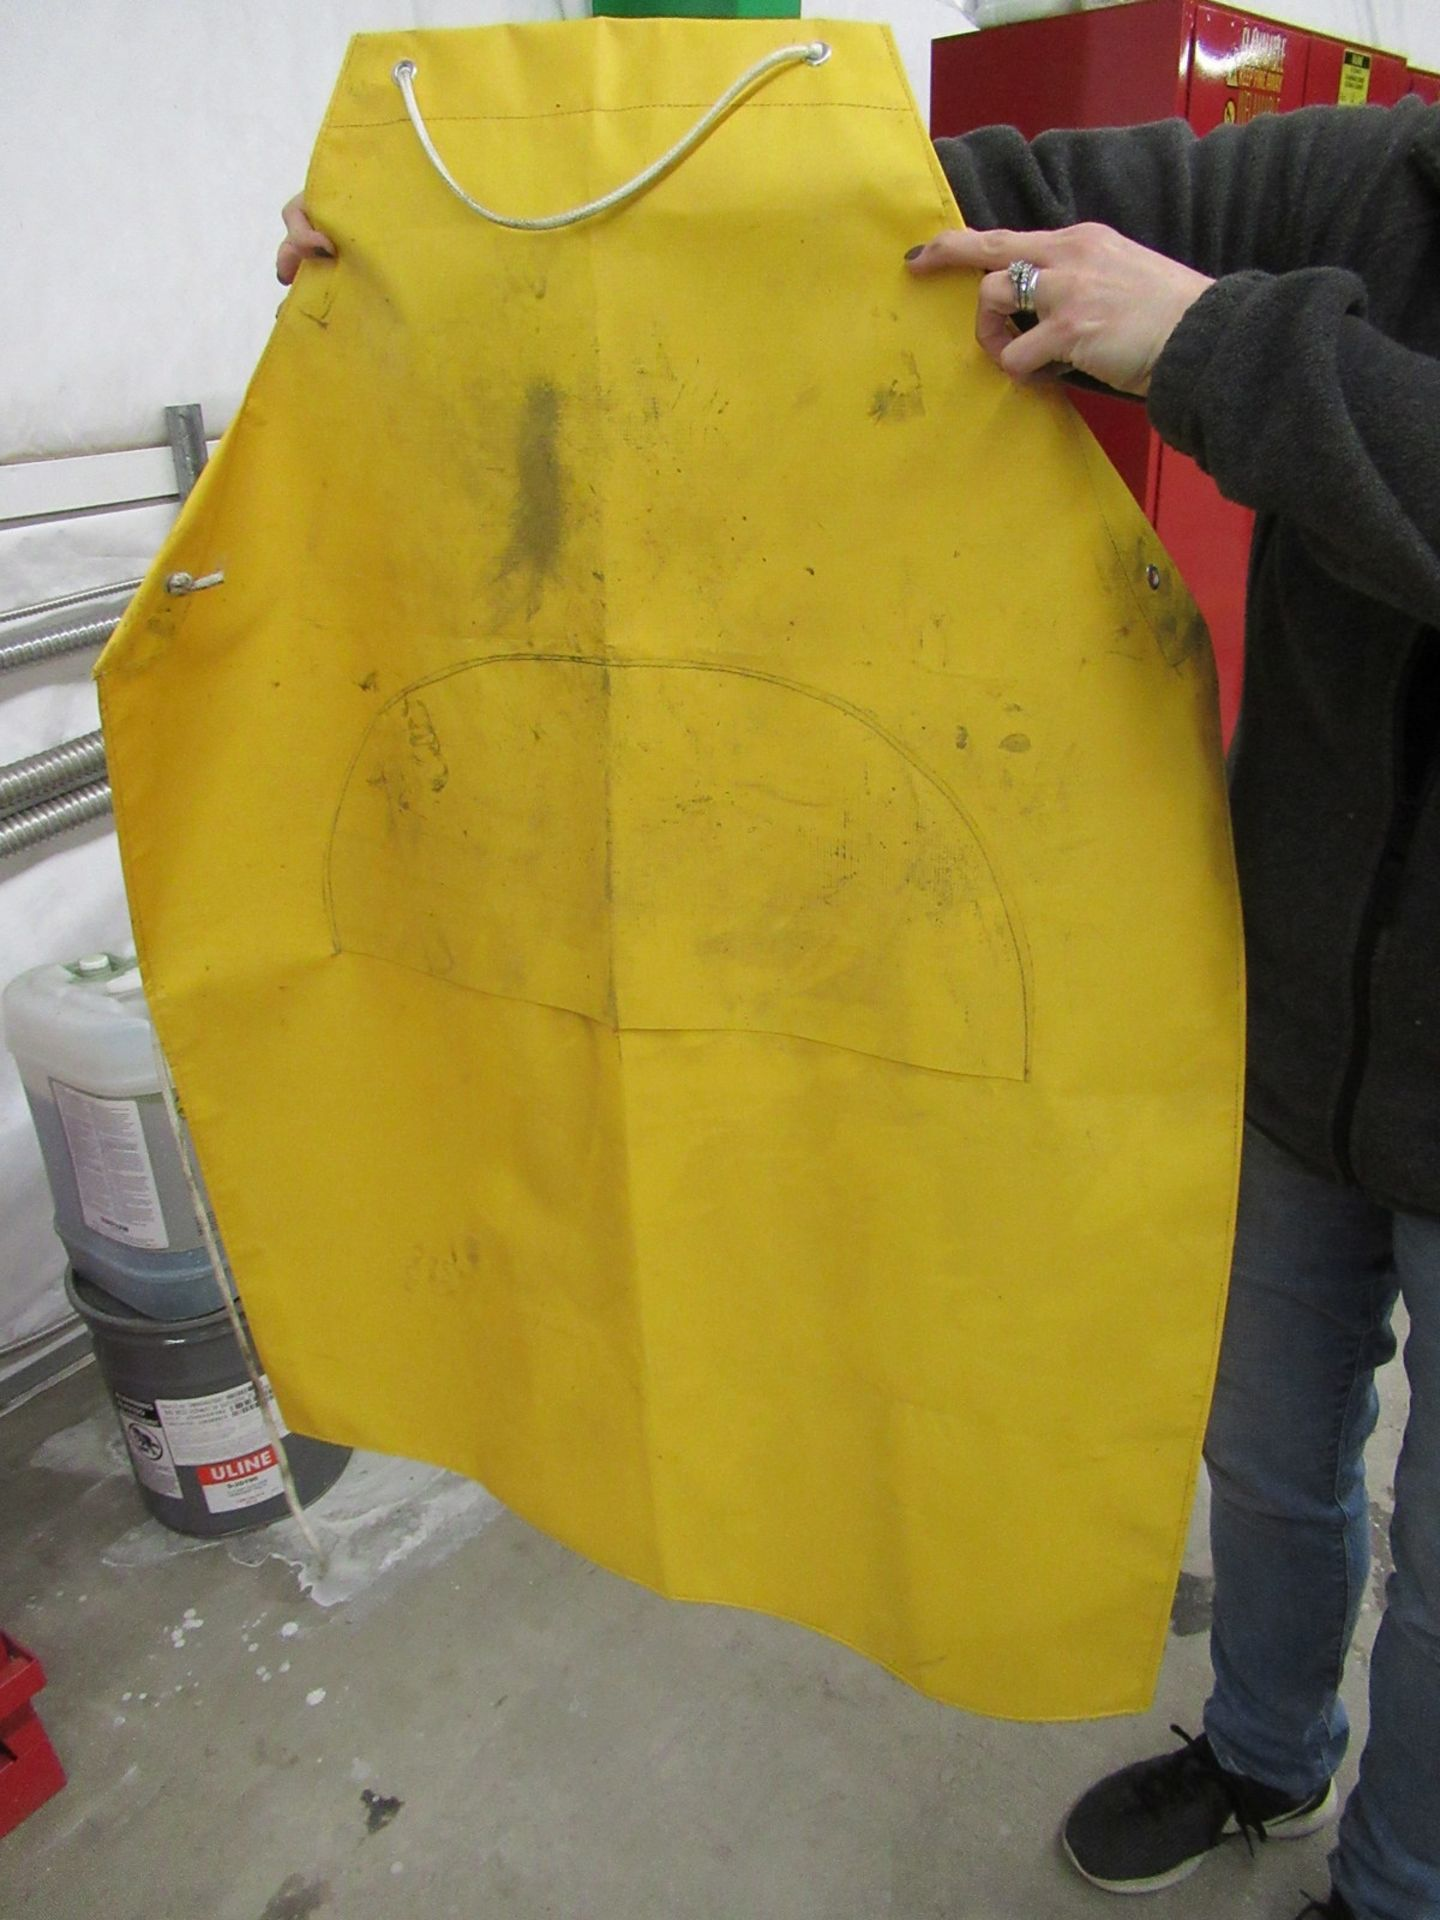 Lot 213 - Justrite Flammable Liquid Rinse Tank & Apron 11 Gallon